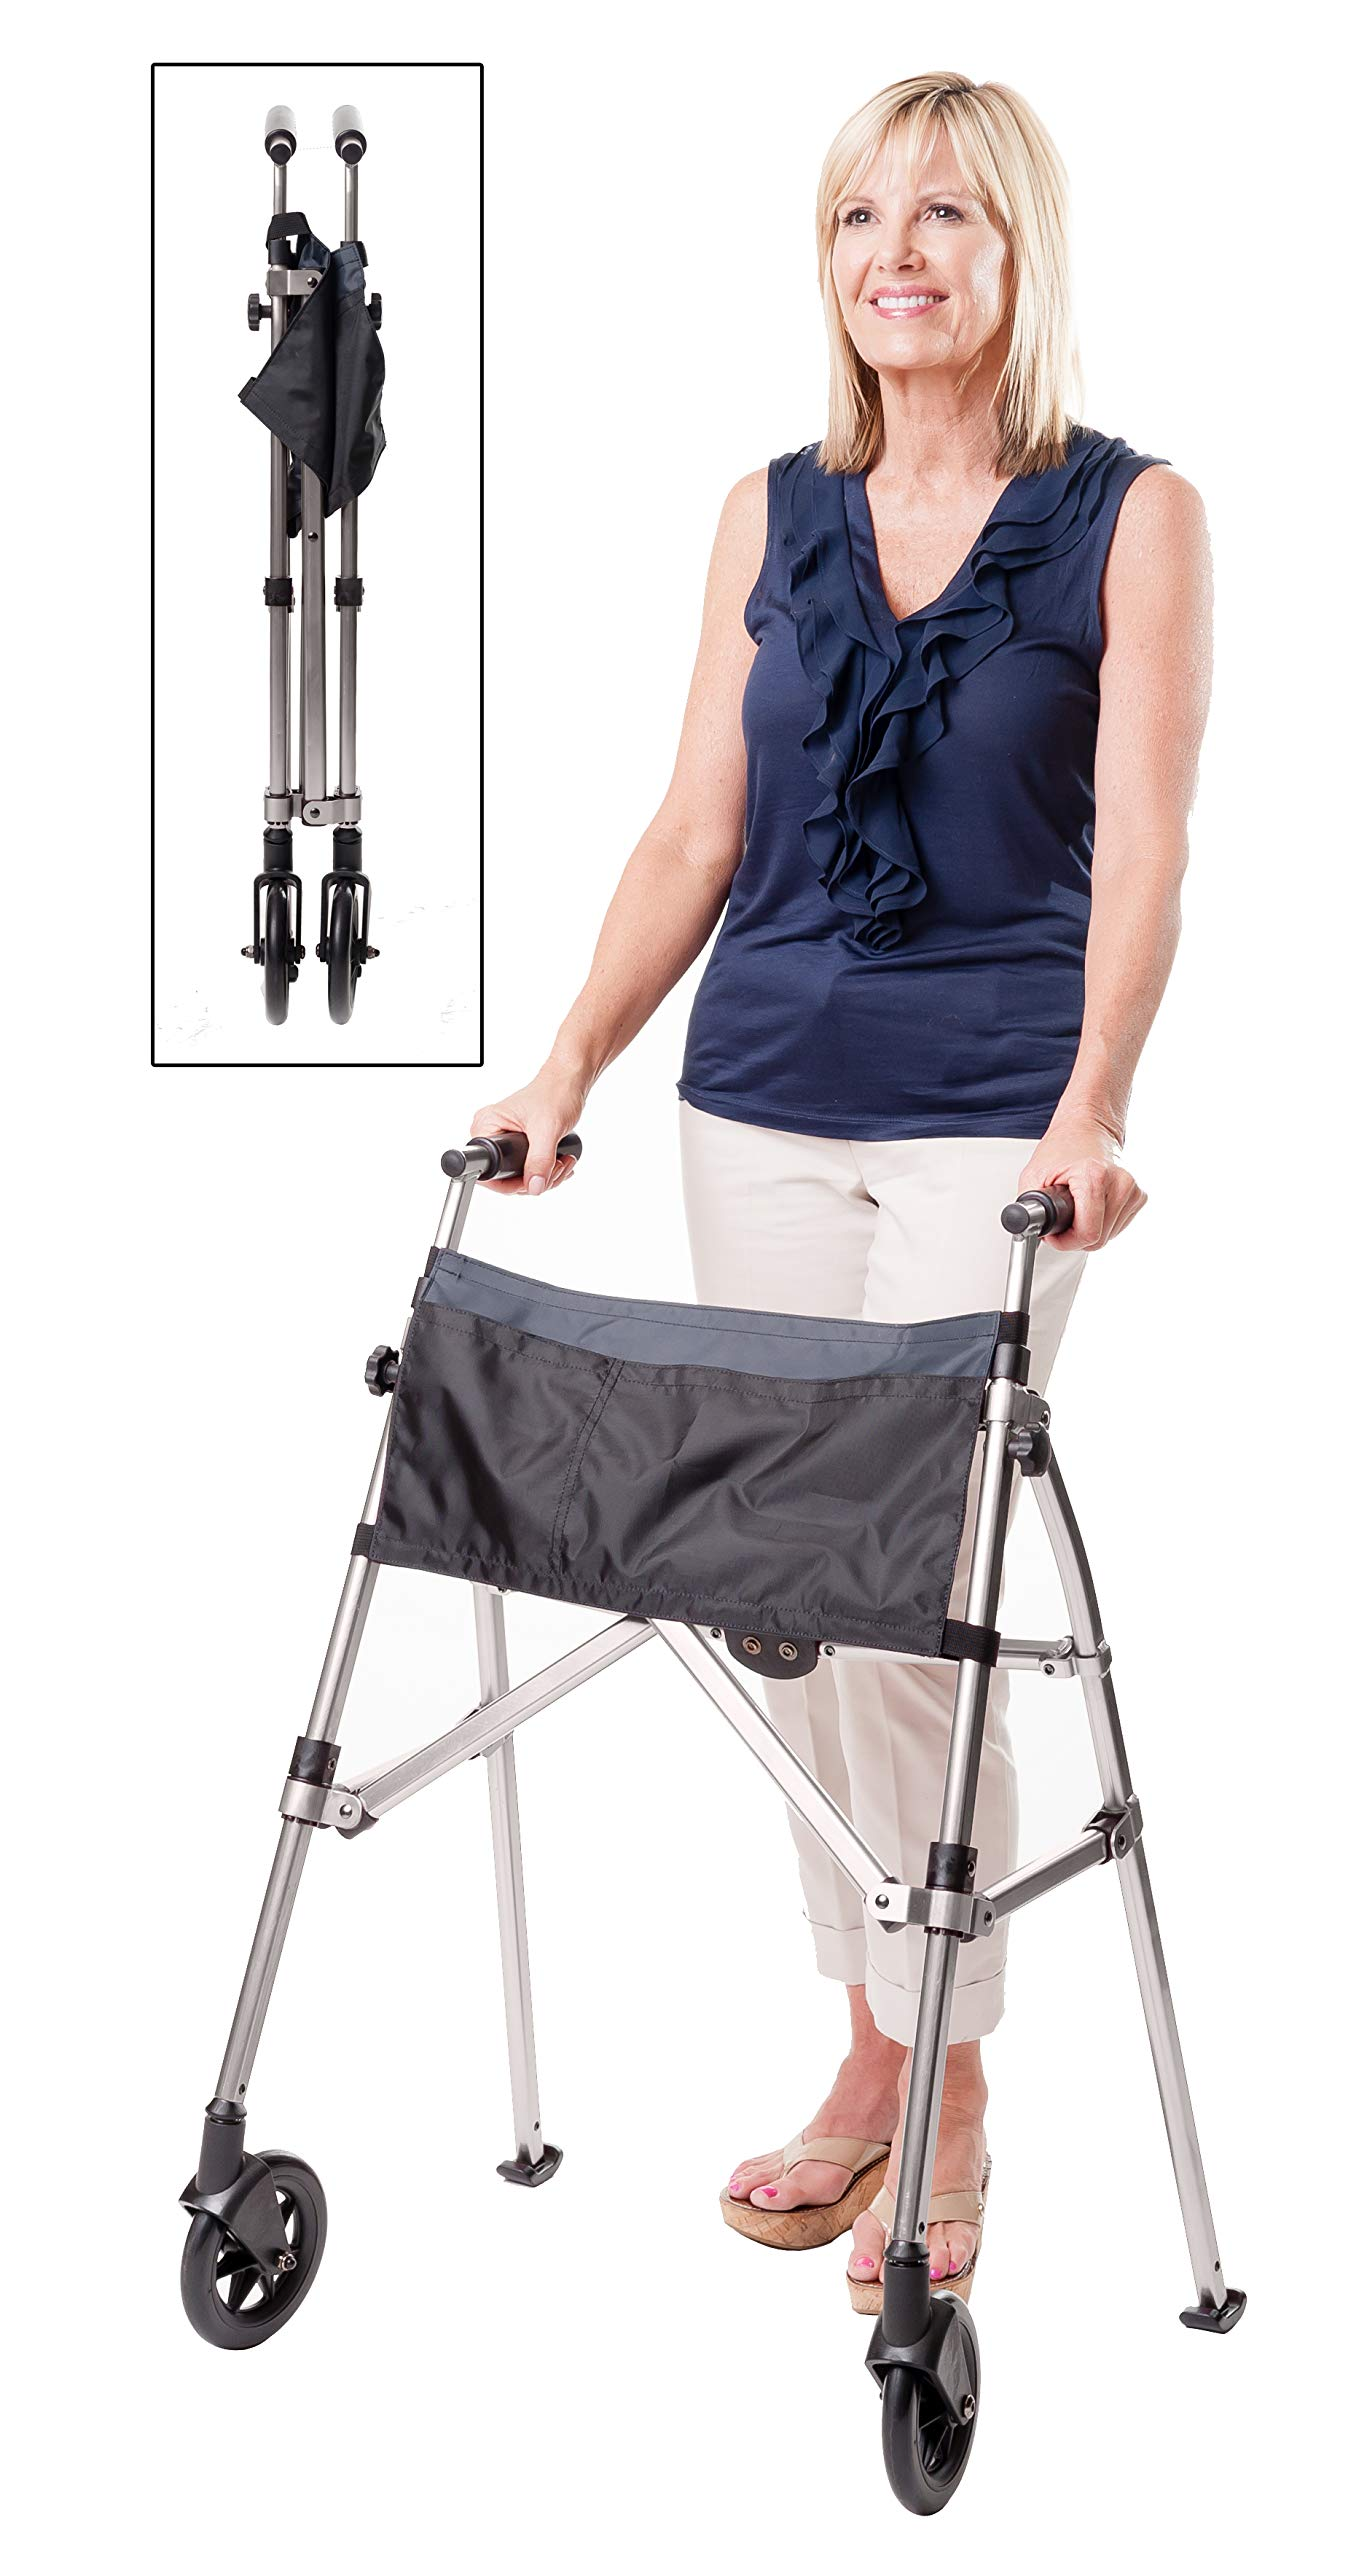 Stander EZ Fold-N-Go Walker - Lightweight Folding & Height Adjustable Adult Travel Walker for Seniors + Locking Swivel Wheels & Pouch - Black Walnut by Stander